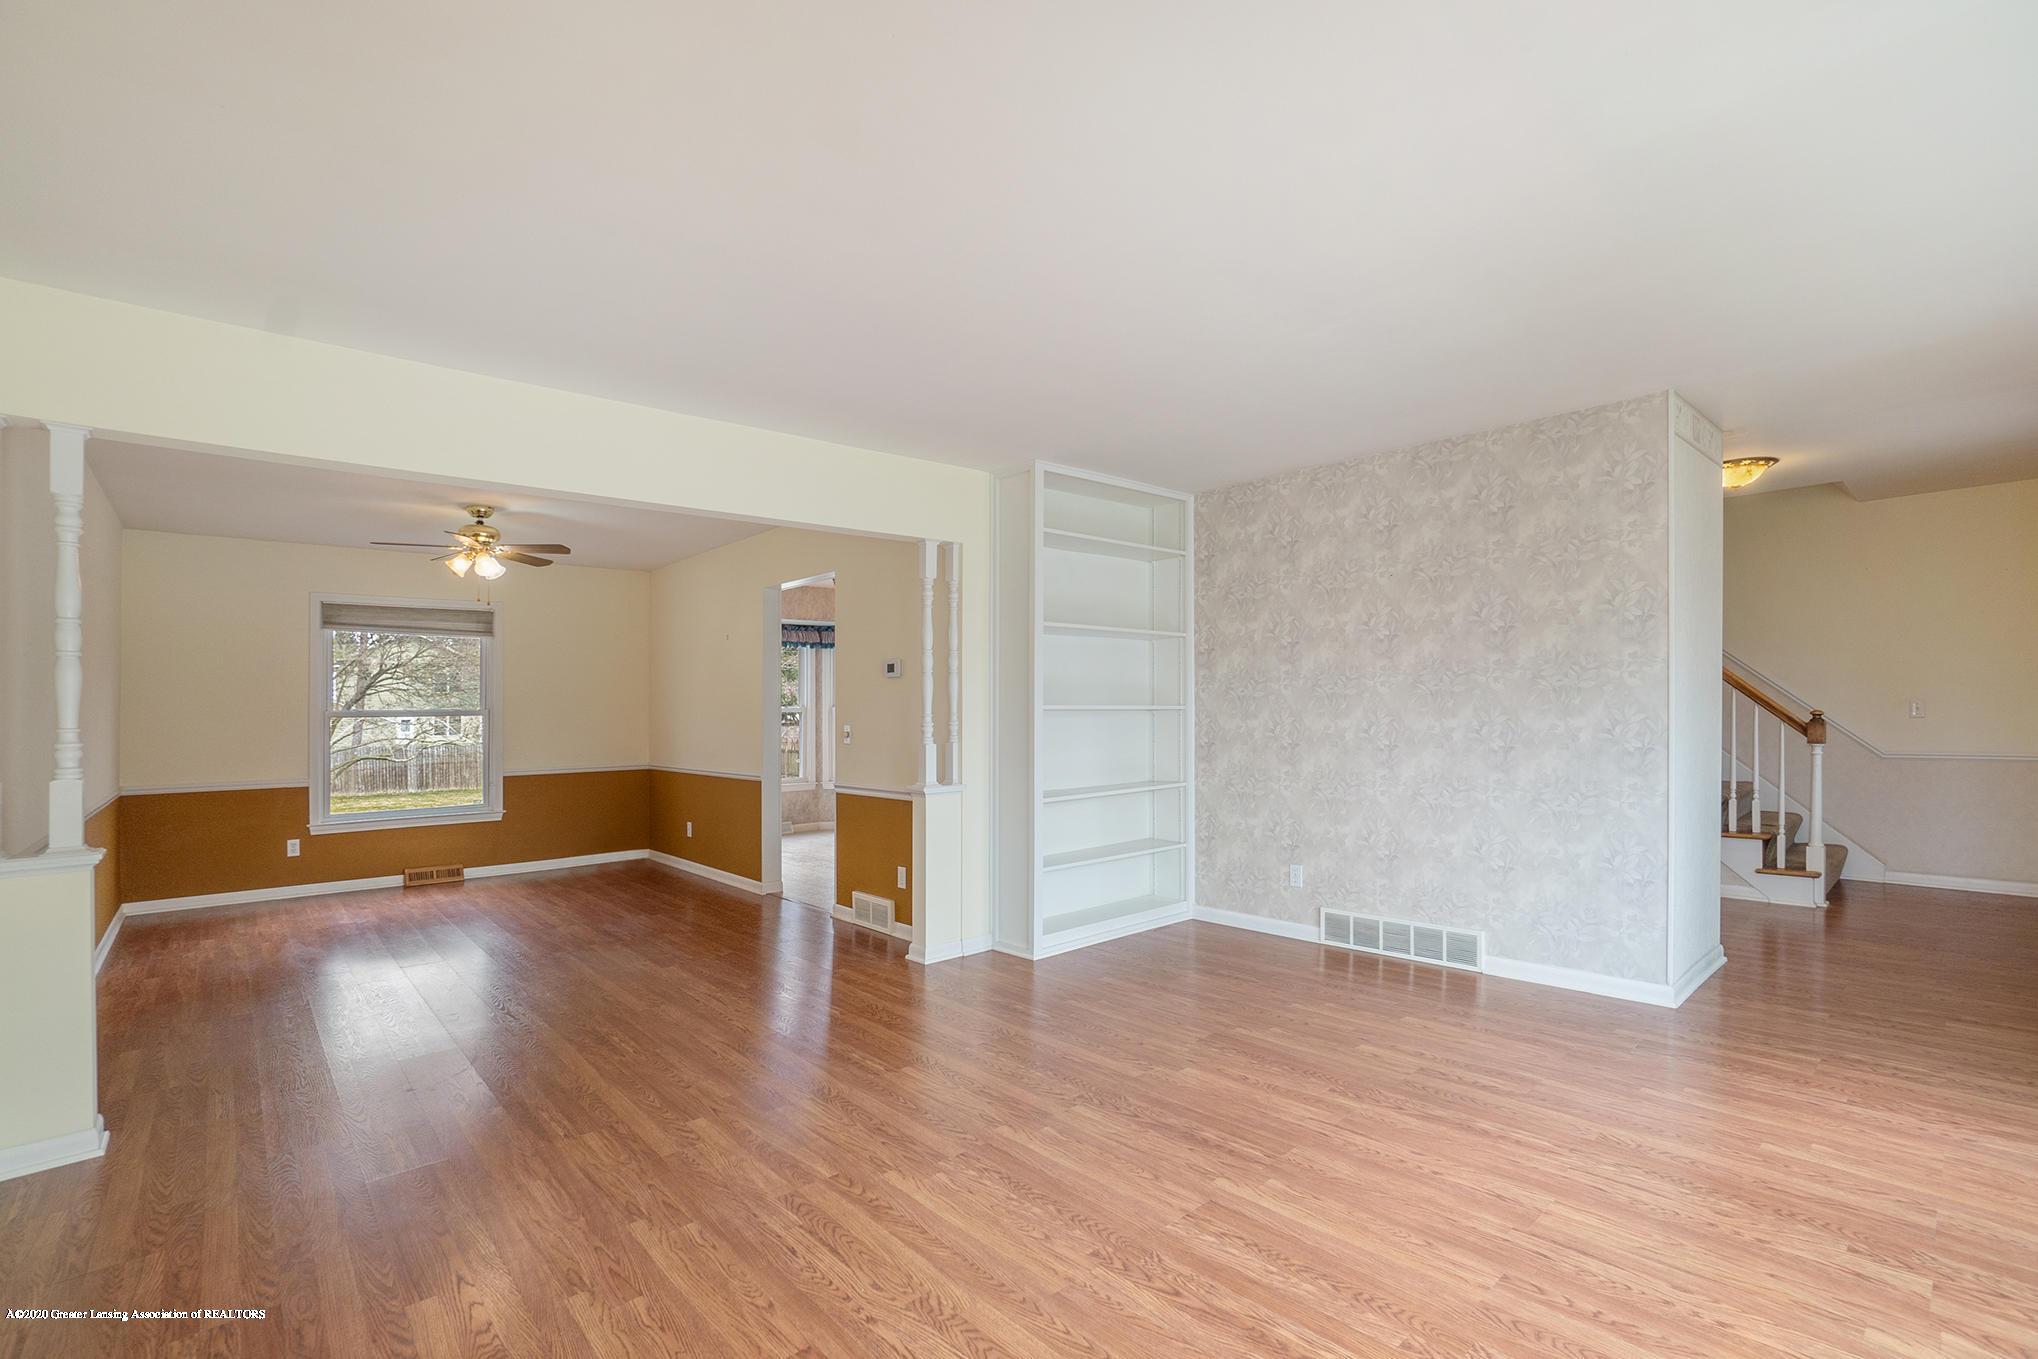 1266 Woodingham Dr - Floor Plan - 15